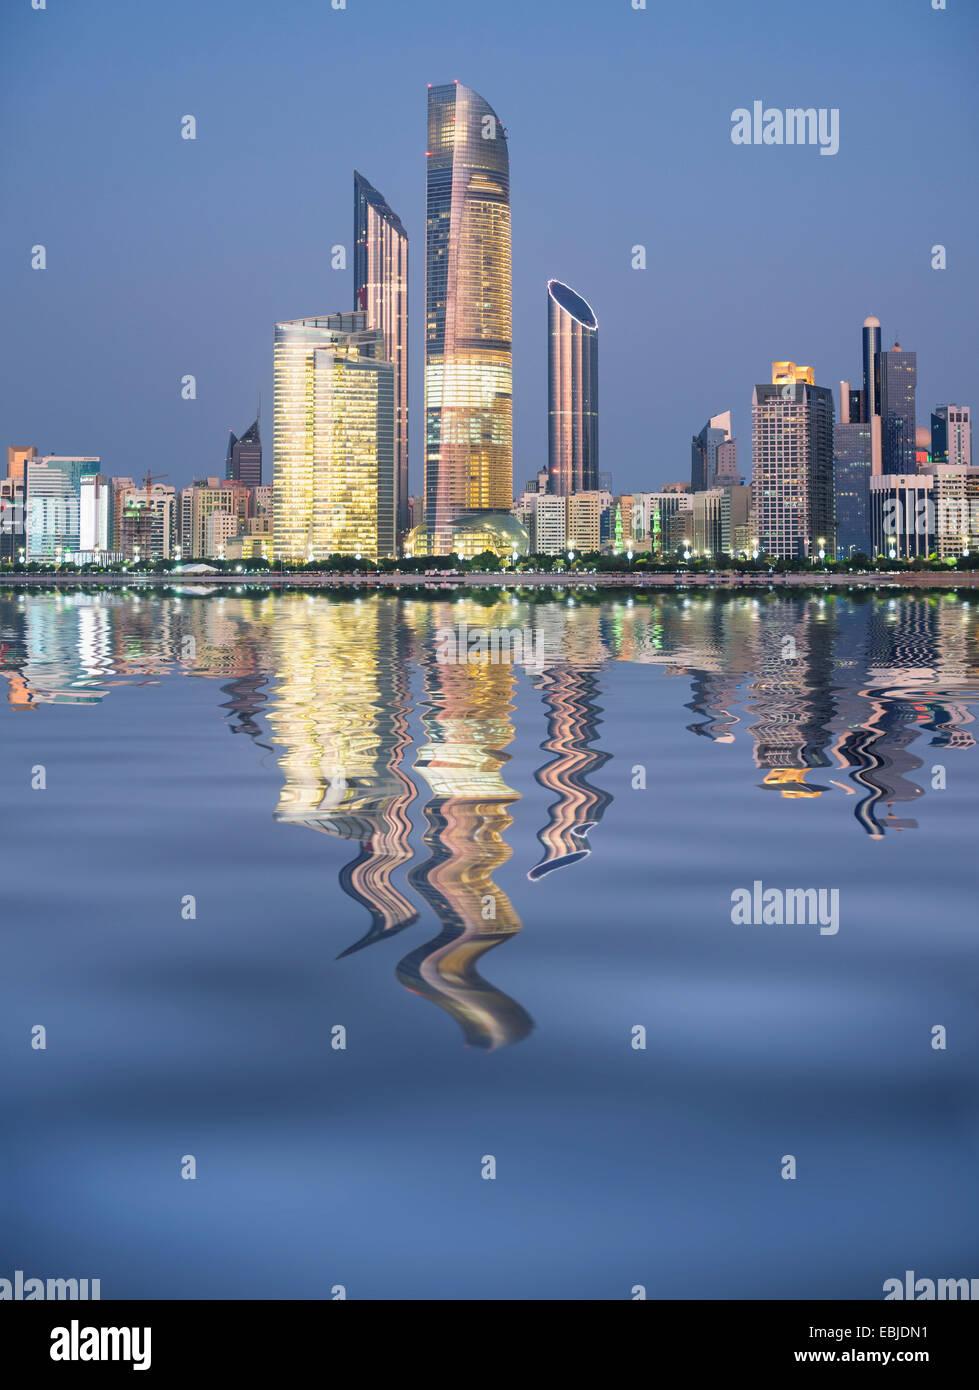 Skyline y reflexión de modernos edificios a lo largo de la Corniche waterfront en Abu Dhabi, Emiratos Árabes Imagen De Stock